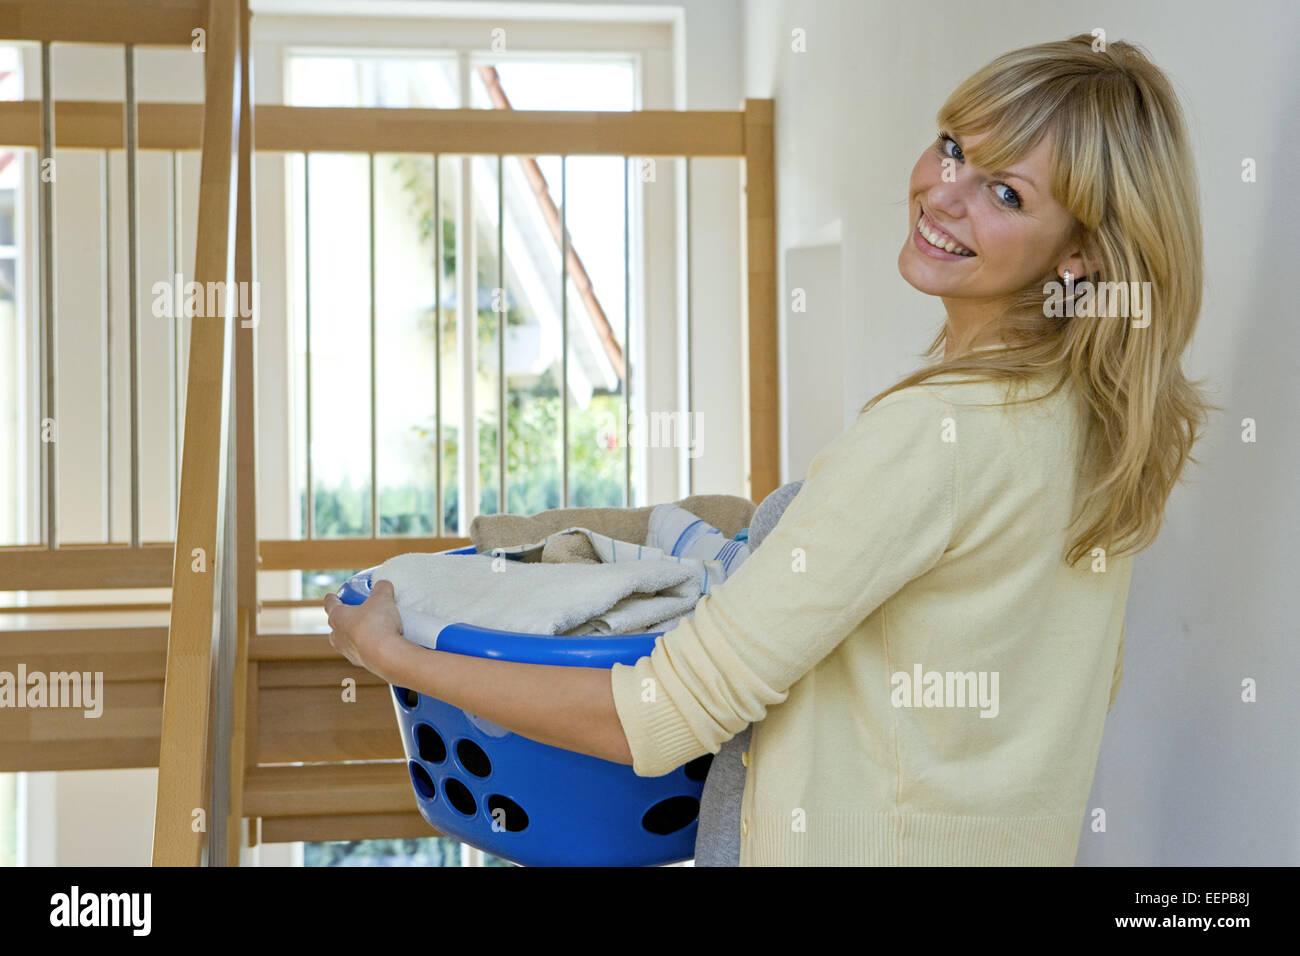 haushalt stock photos haushalt stock images alamy. Black Bedroom Furniture Sets. Home Design Ideas